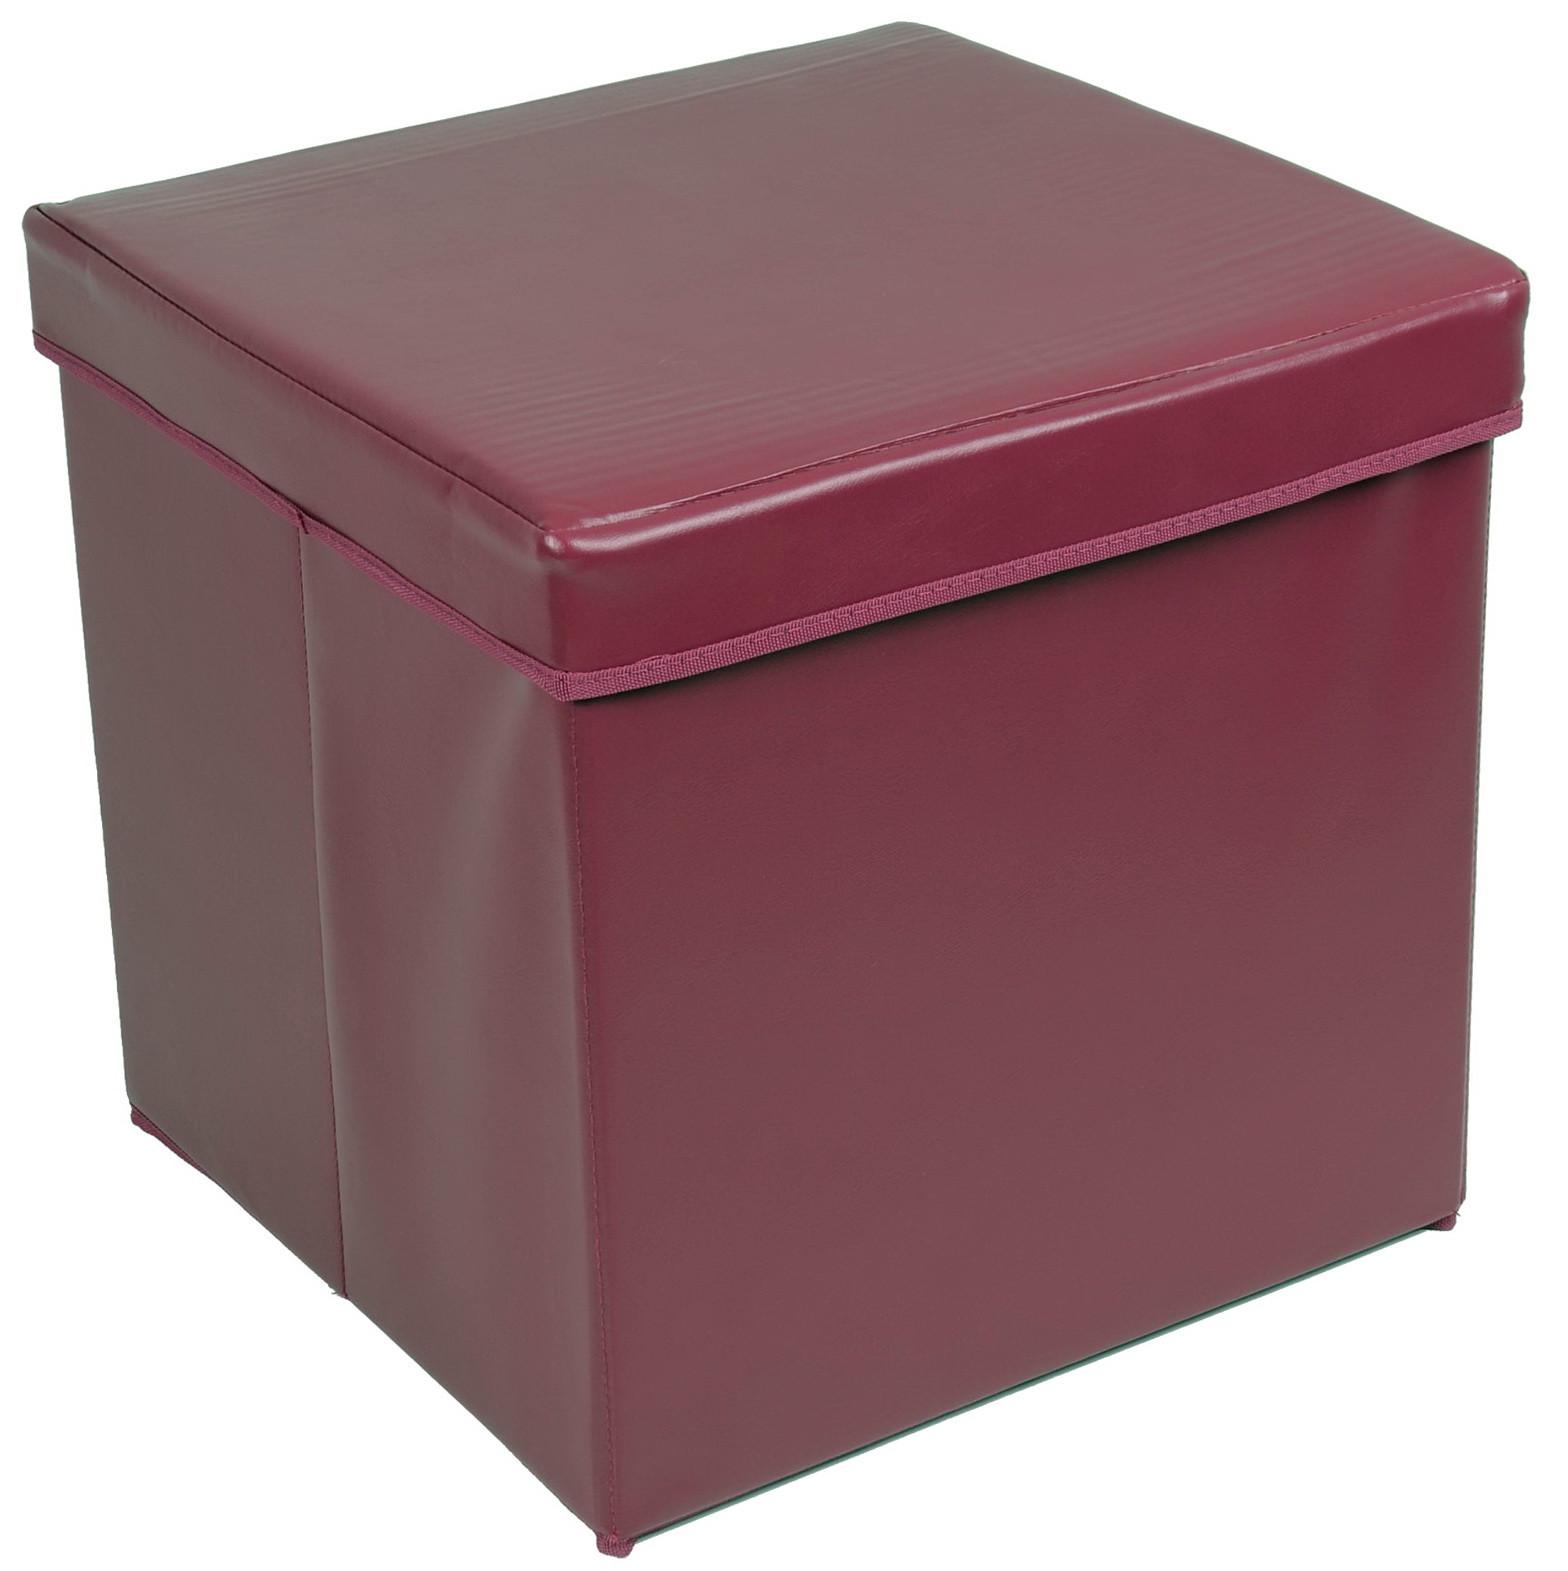 Best ideas about DIY Storage Ottoman Cube . Save or Pin Diy Storage Cube Ottoman Now.